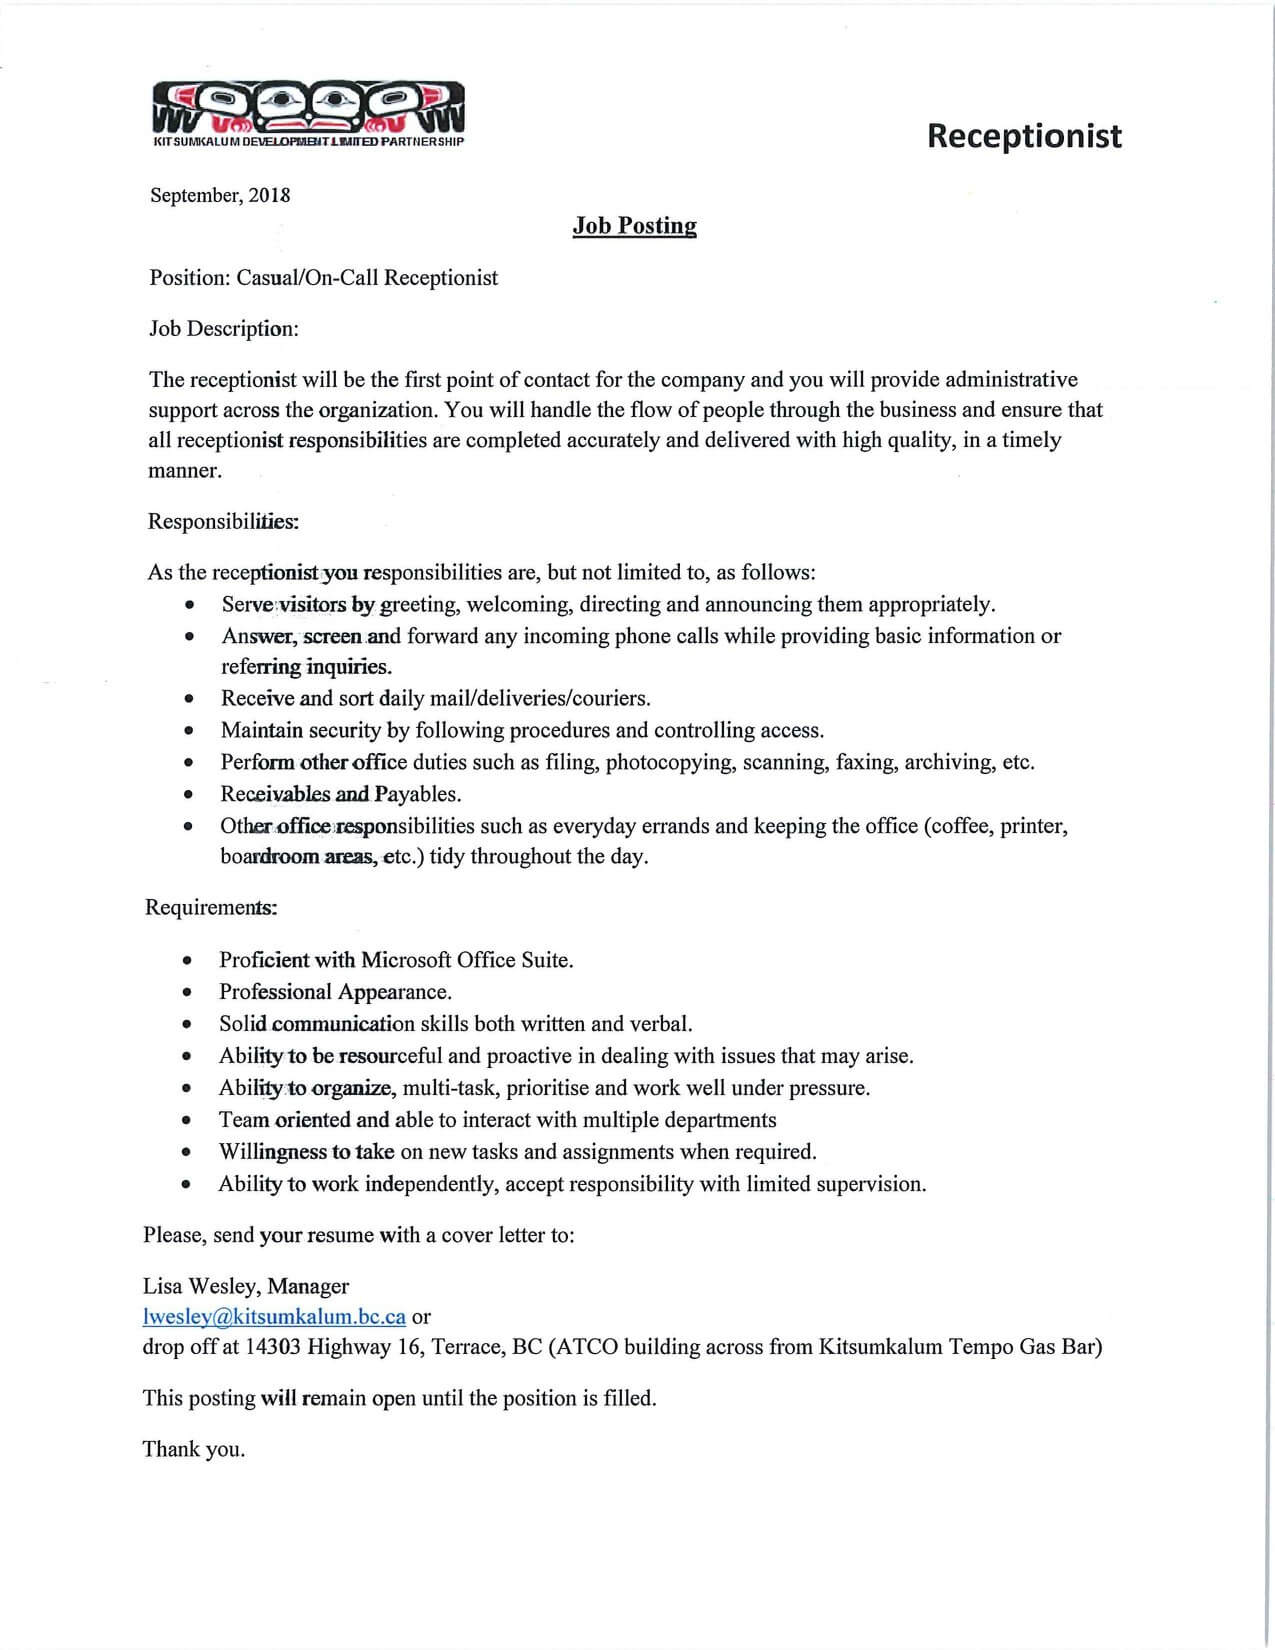 Receptionist Job Posting